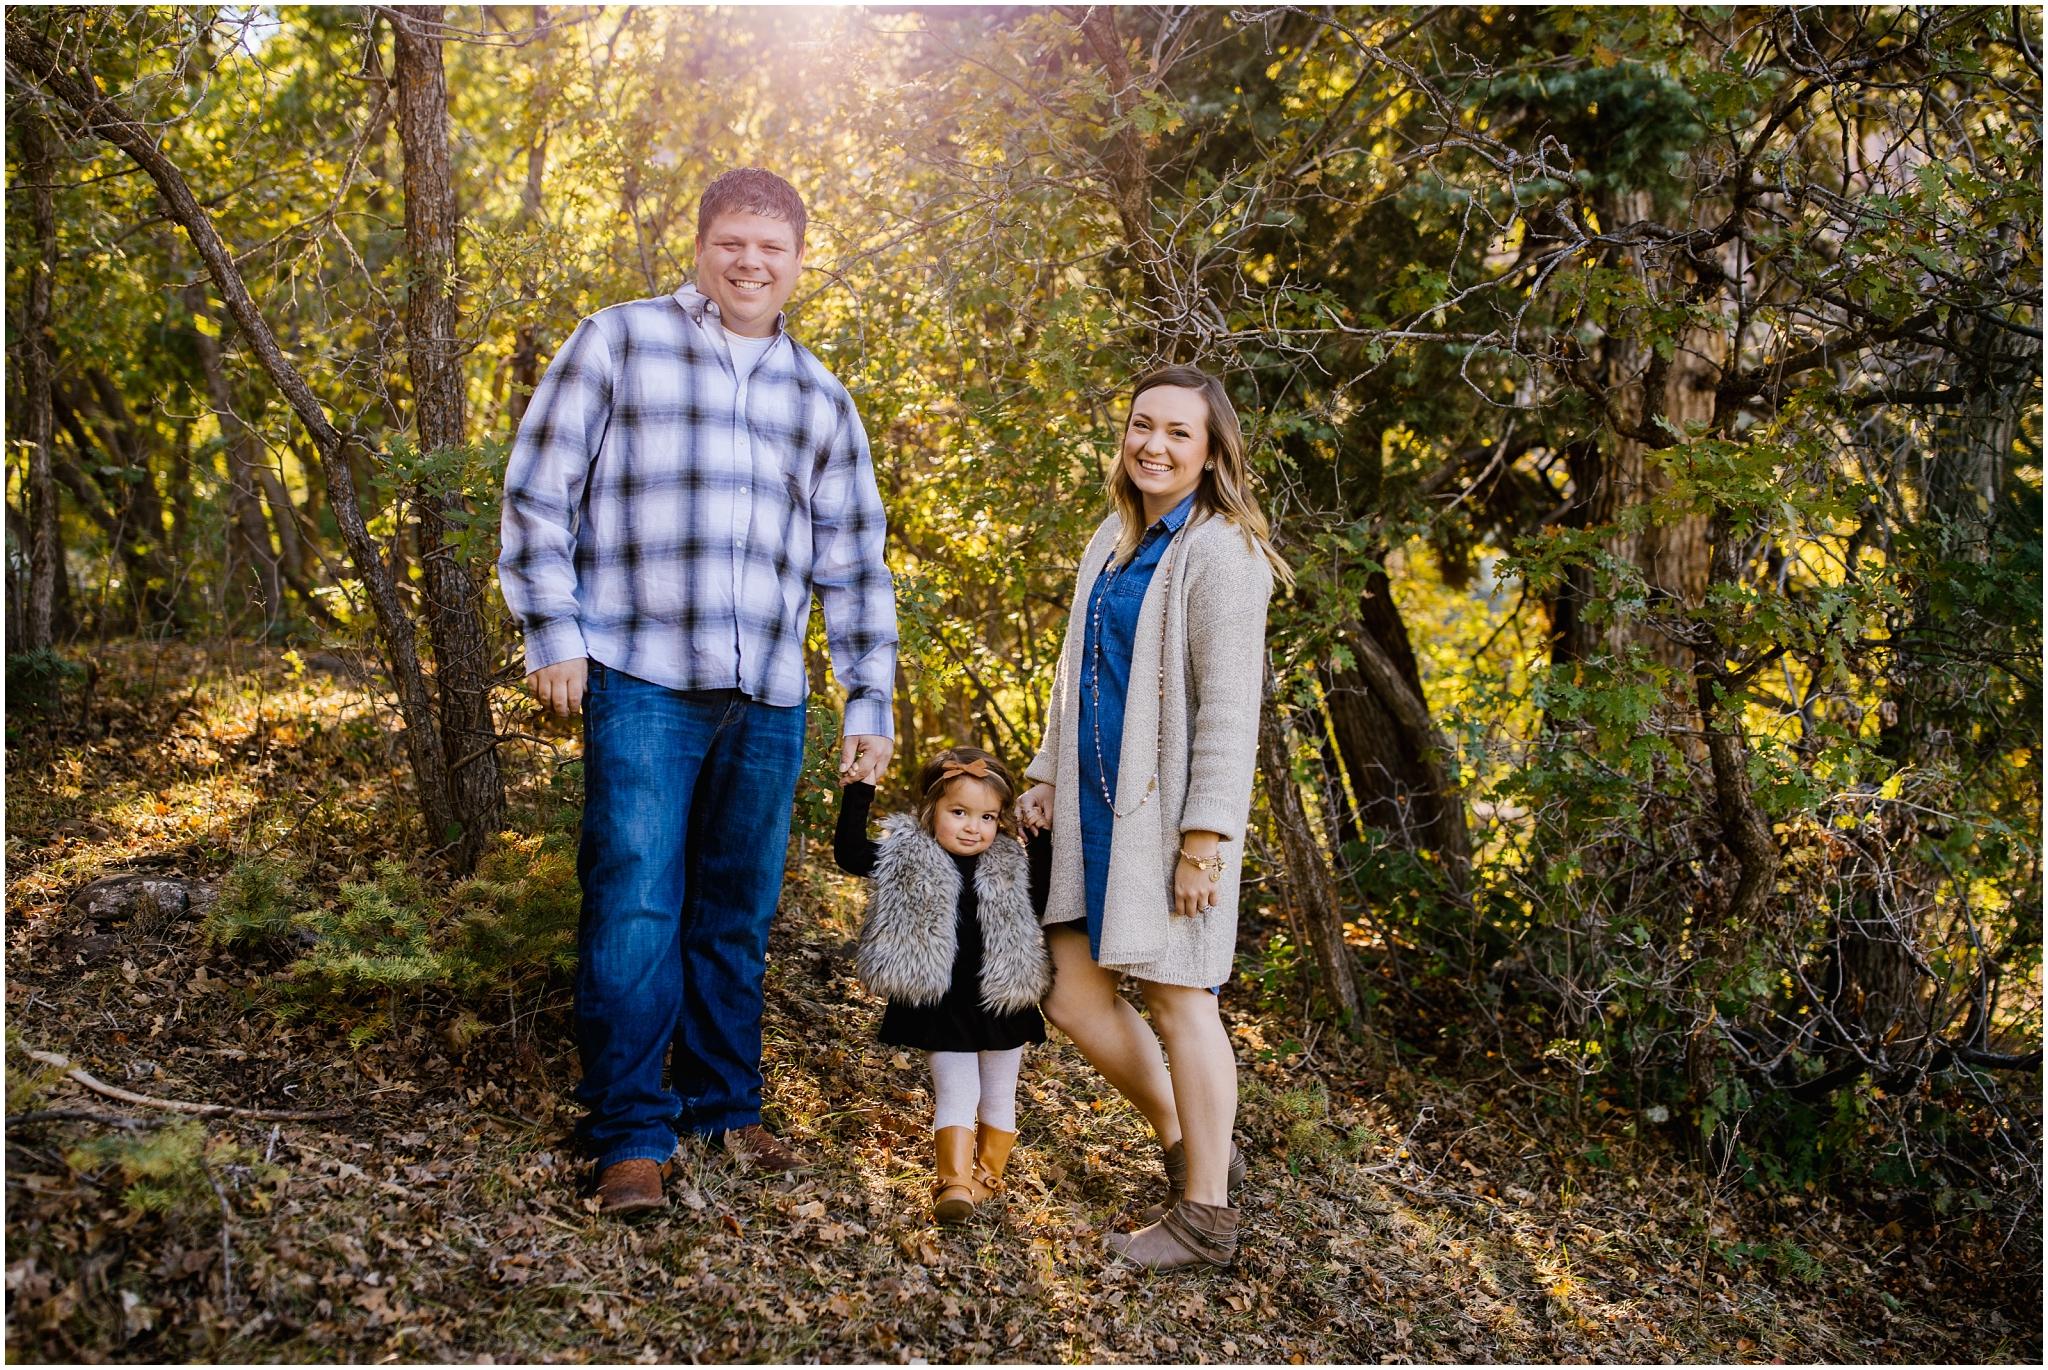 Frandsen-2_Lizzie-B-Imagery-Utah-Family-Photographer-Utah-County-Central-Utah-Park-City-Salt-Lake-City.jpg